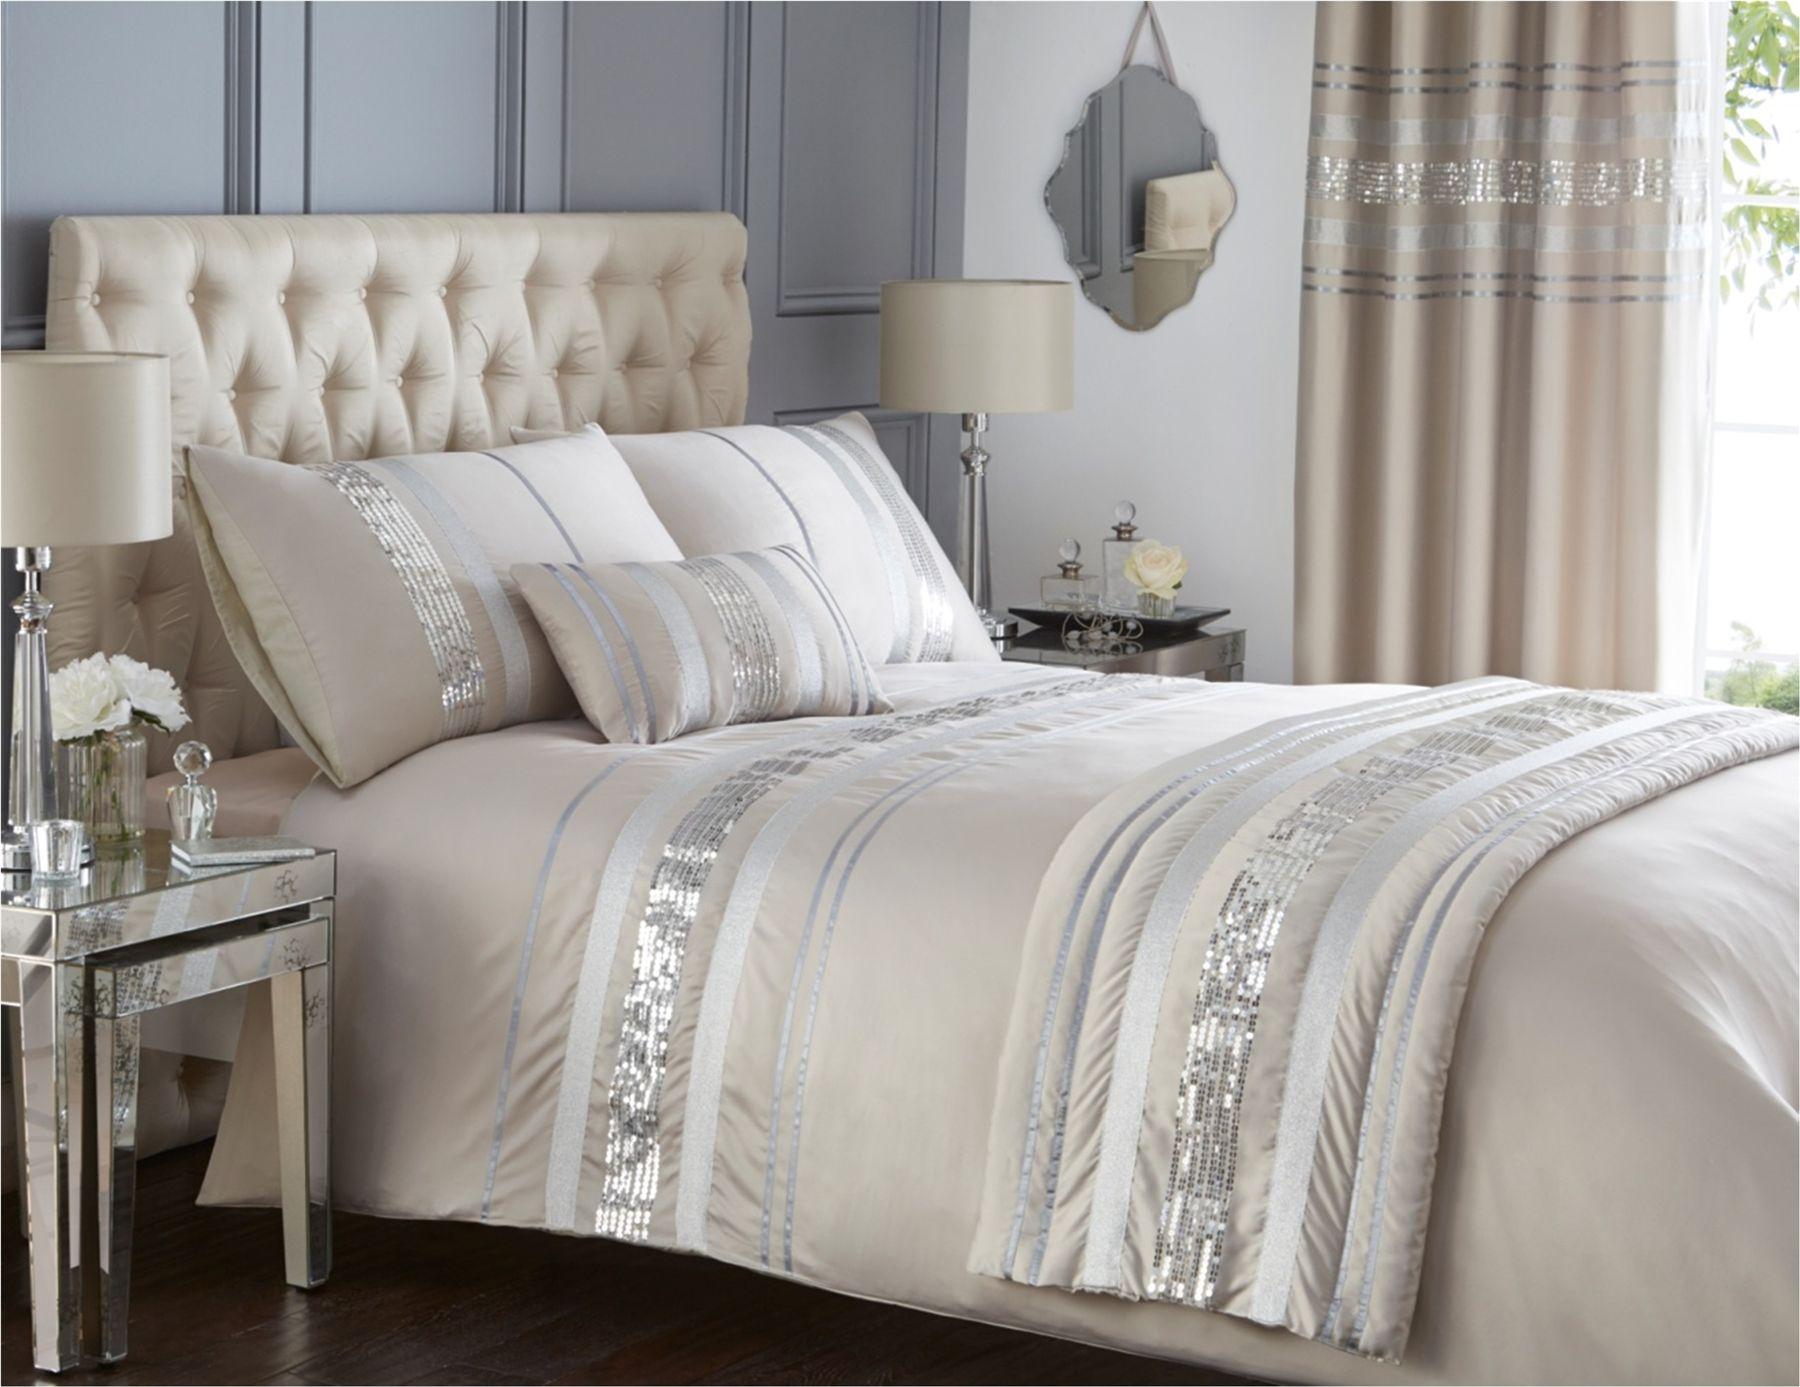 Modern sequin quilt duvet cover 2 pillowcase bedding bed - Housse de couette beige taupe ...